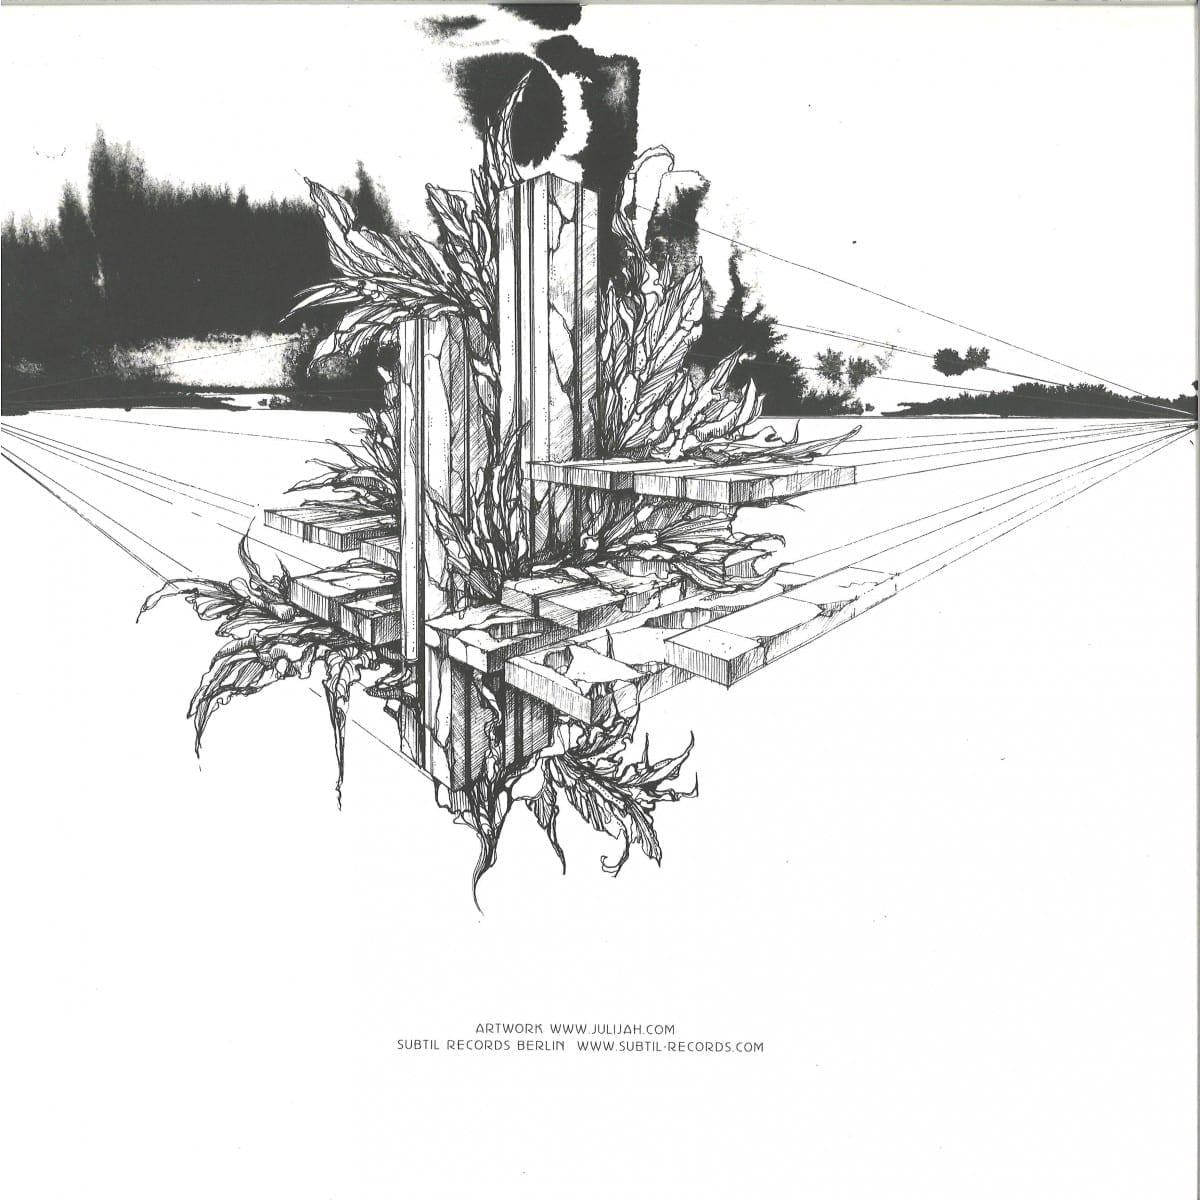 Traumer- Temple [Subtil] 02